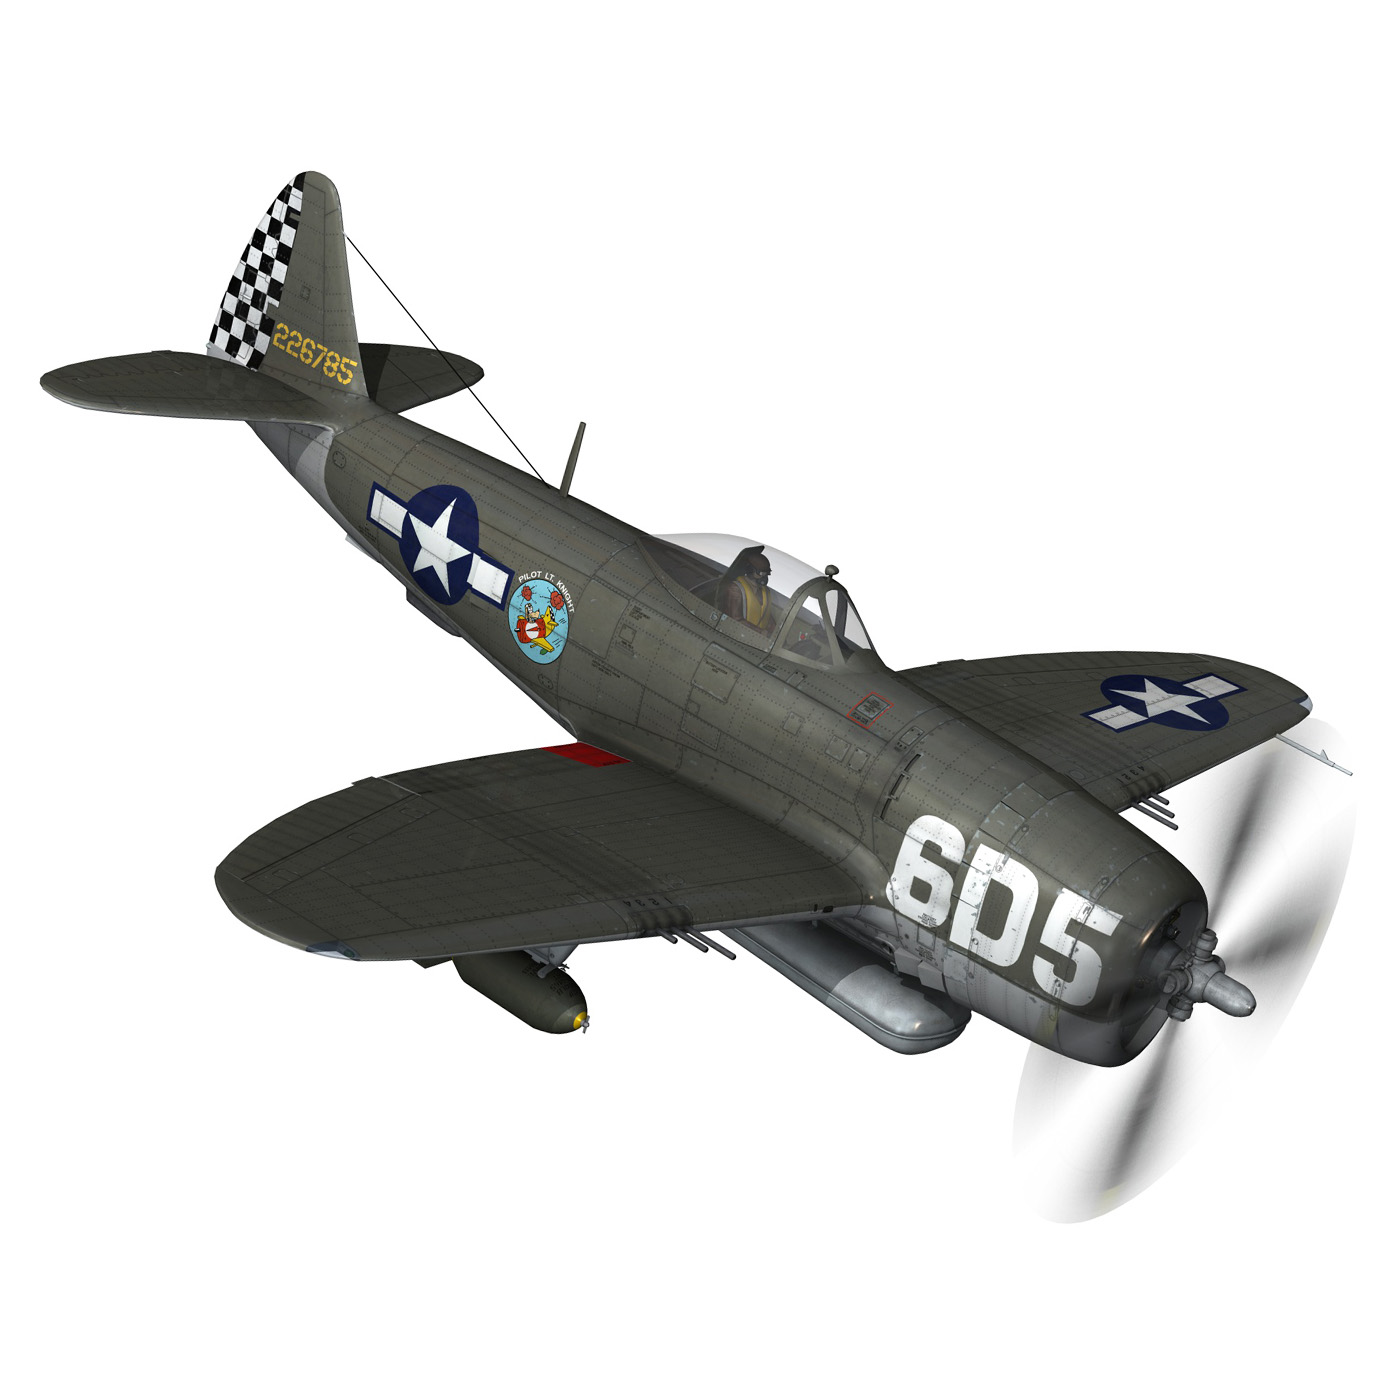 republic p-47 thunderbolt – oh johnnie 3d model fbx c4d lwo obj 274253